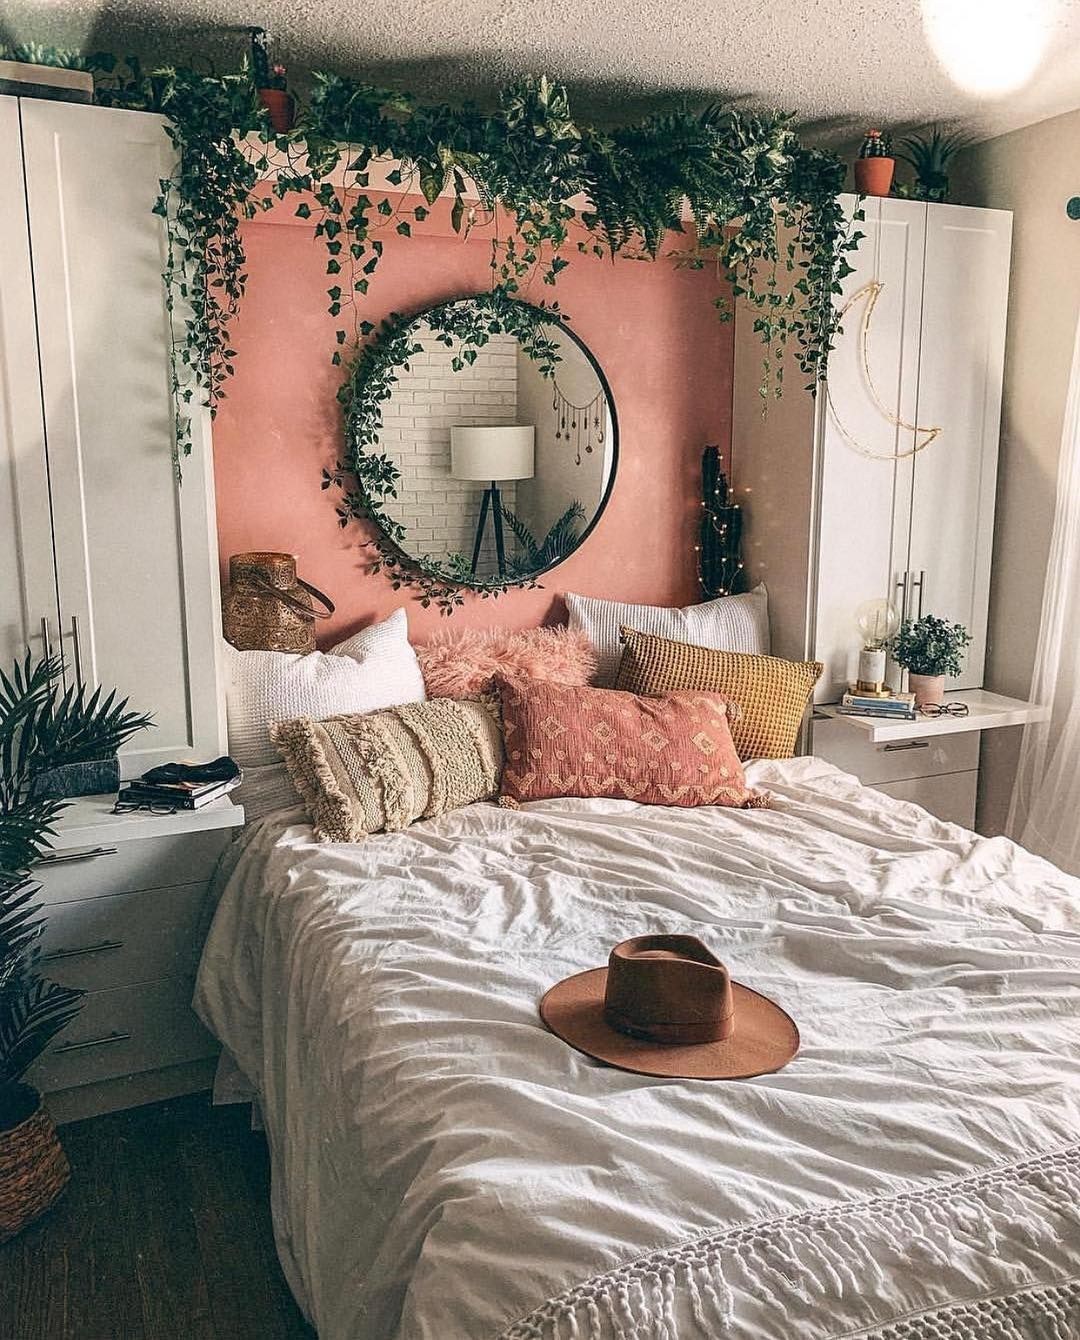 "Interior Design & Decor on Instagram: ""via @hippie.tribe Bedroom goals"